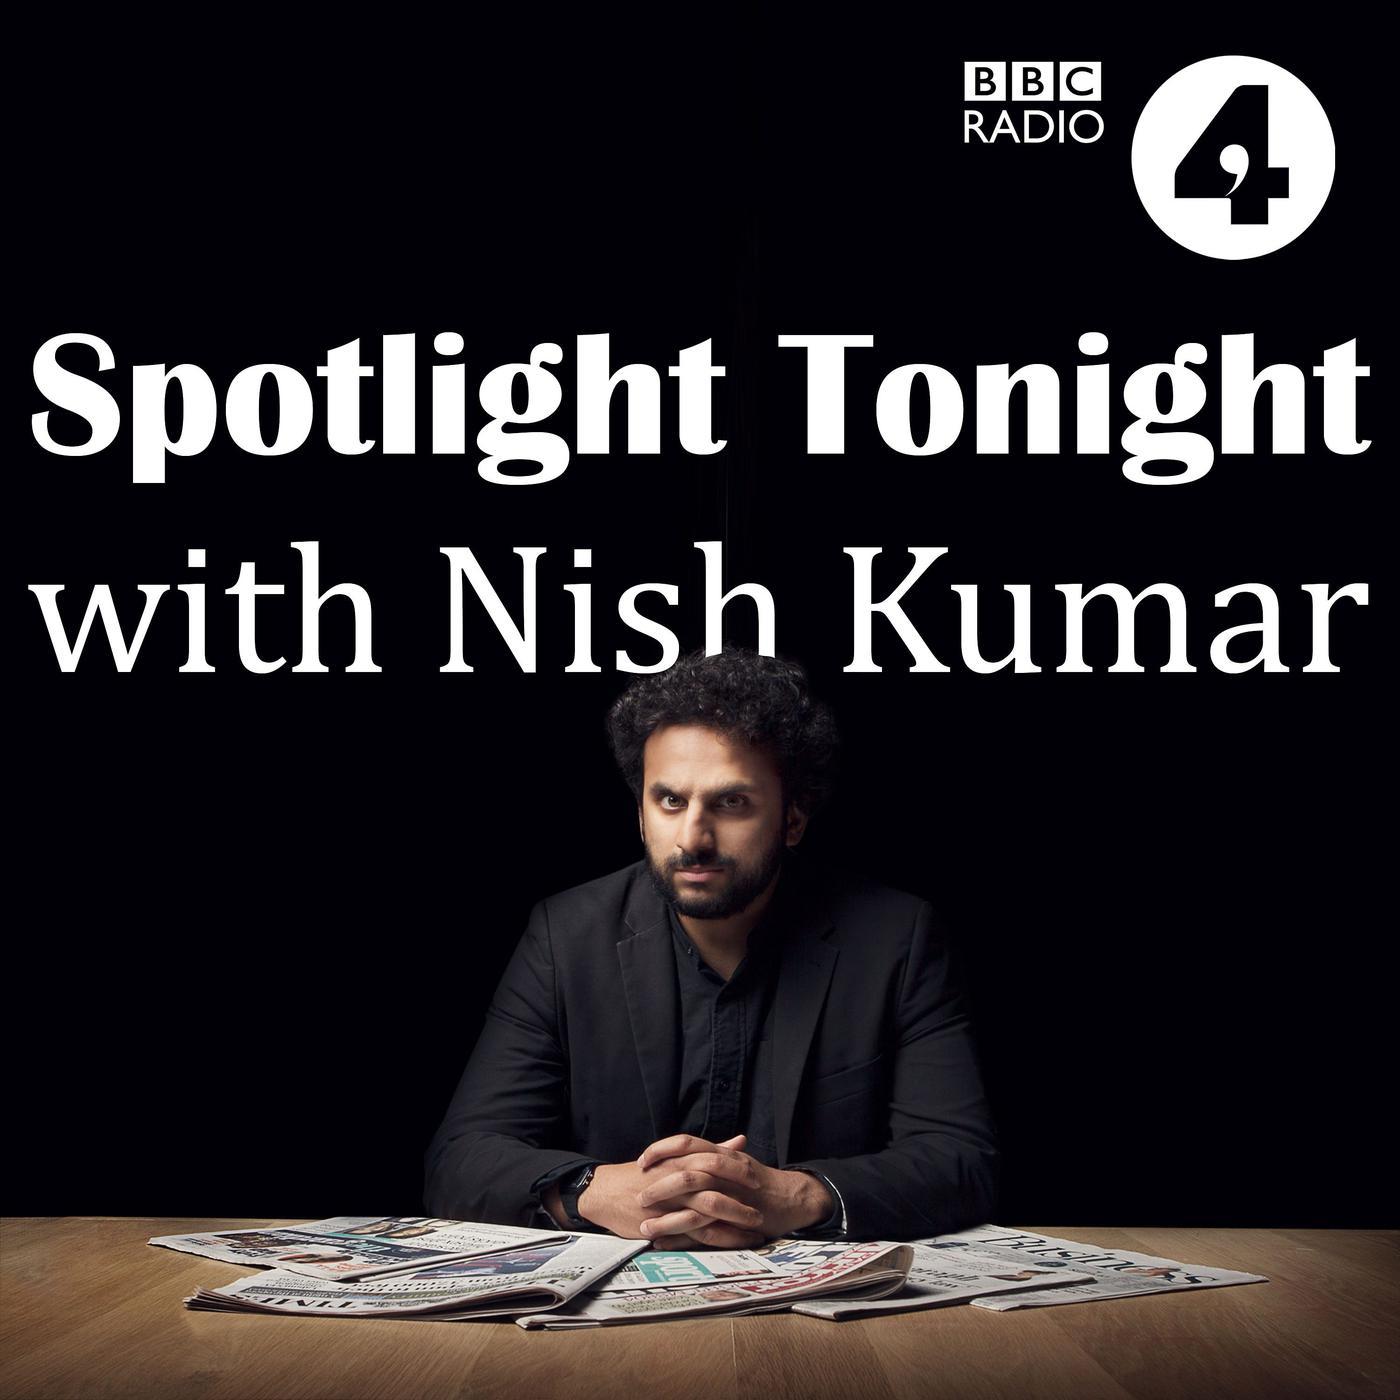 Spotlight Tonight with Nish Kumar (podcast) - BBC Radio 4   Listen Notes